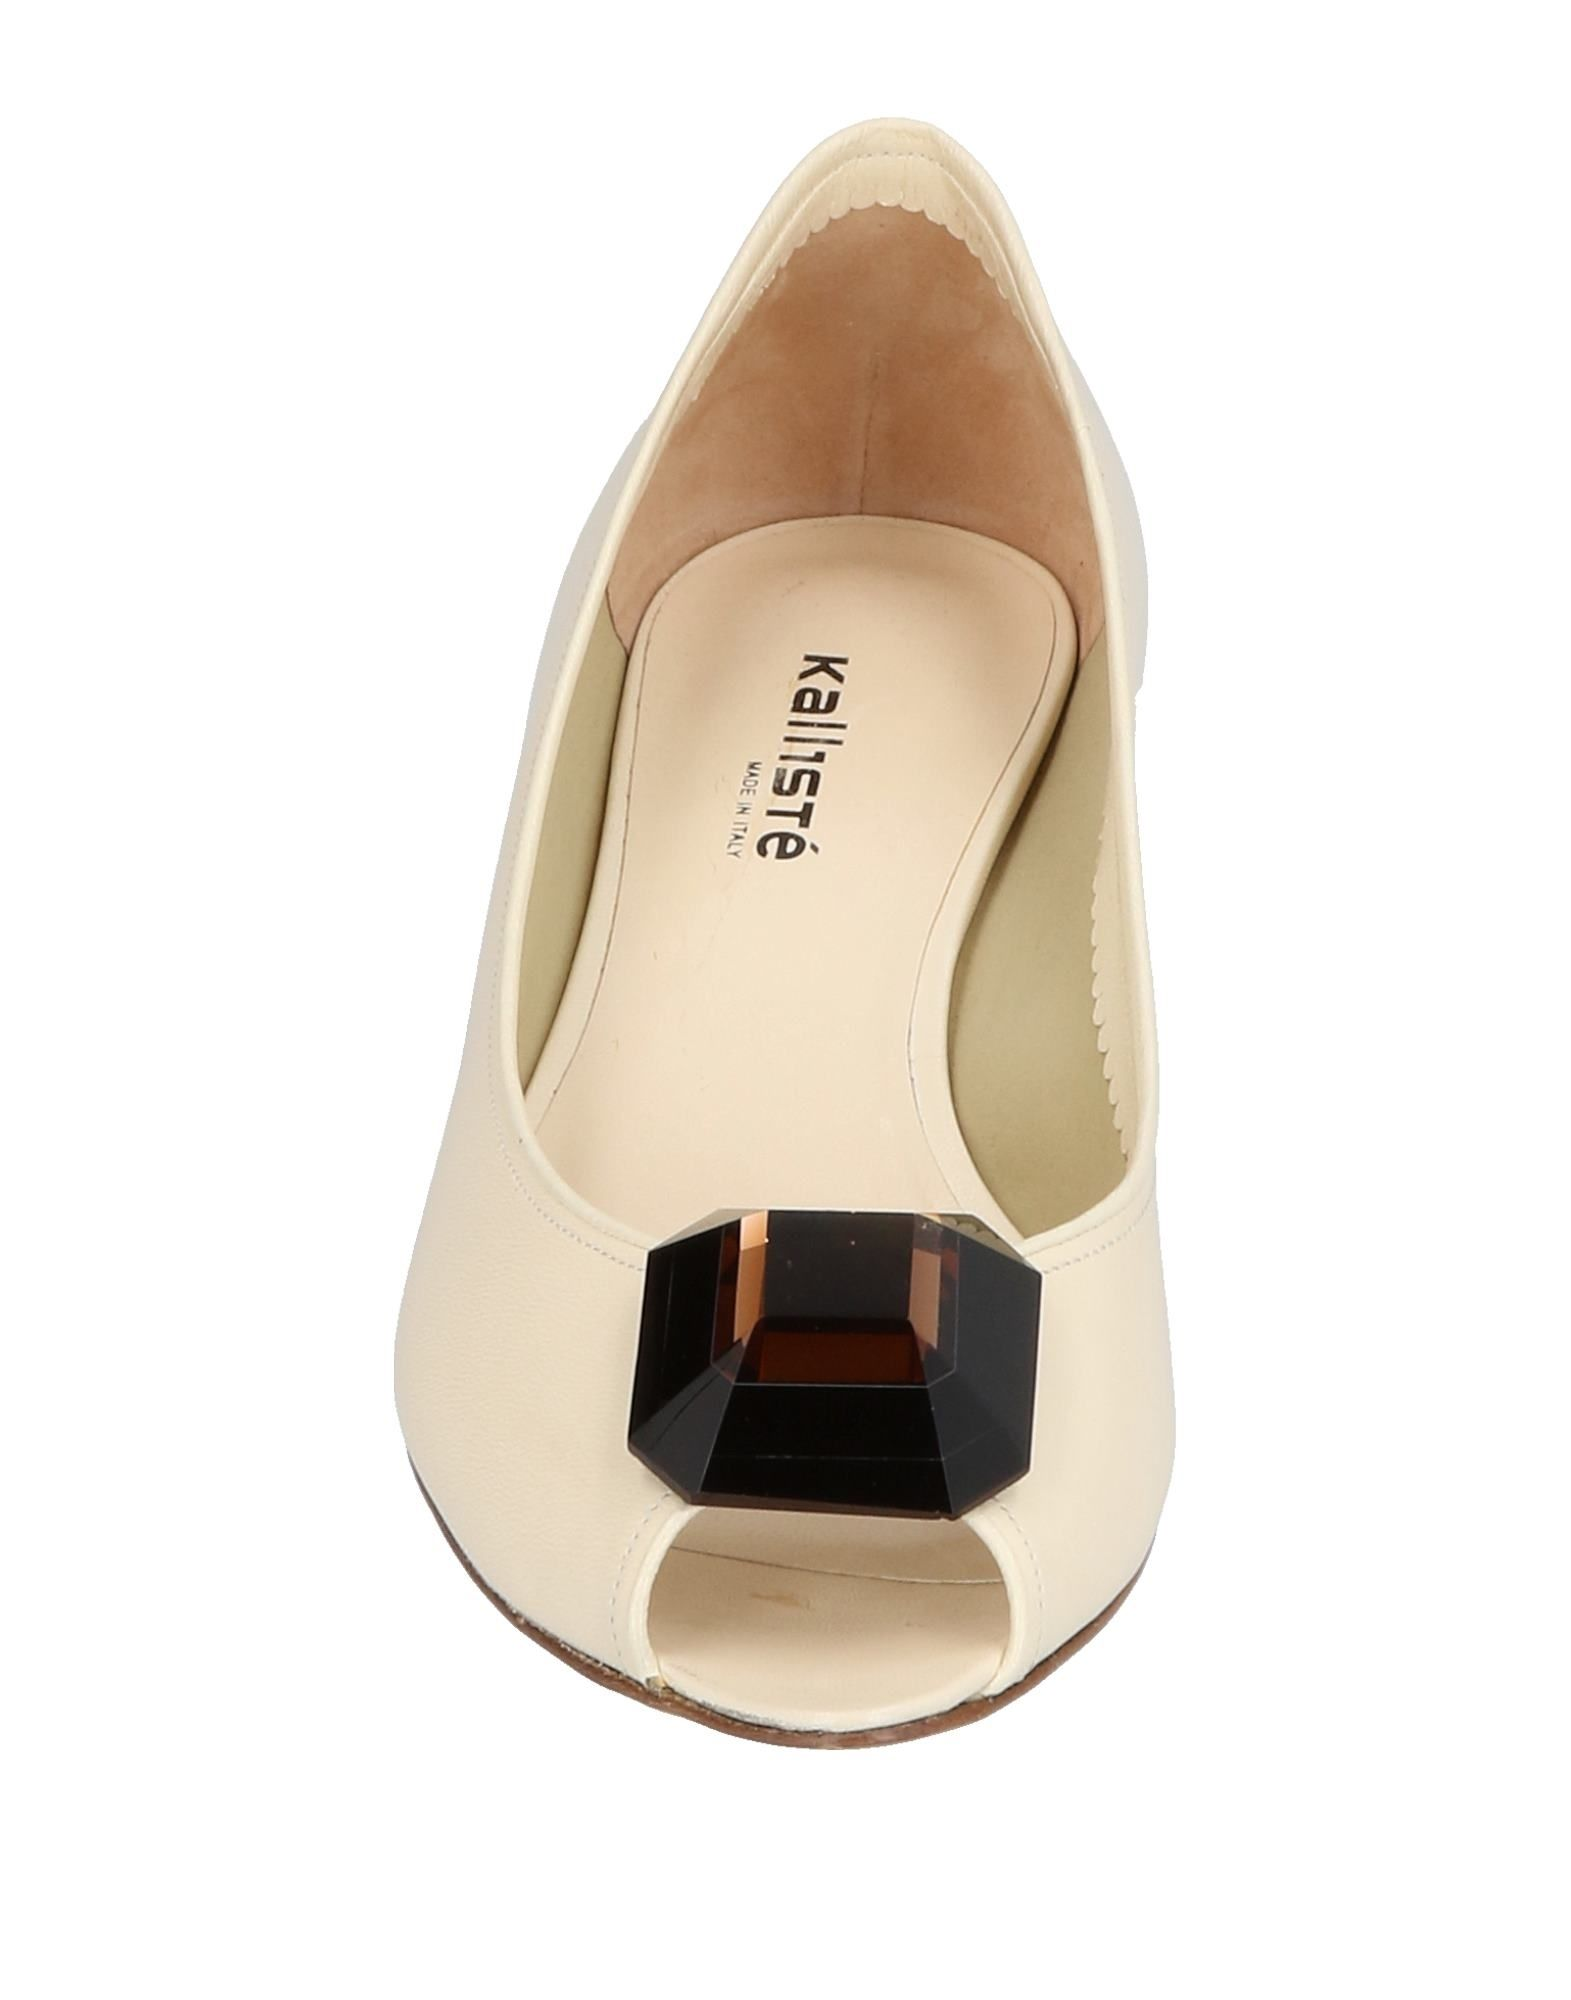 Kallistè Ballerinas Qualität Damen  11424758IK Gute Qualität Ballerinas beliebte Schuhe 587feb